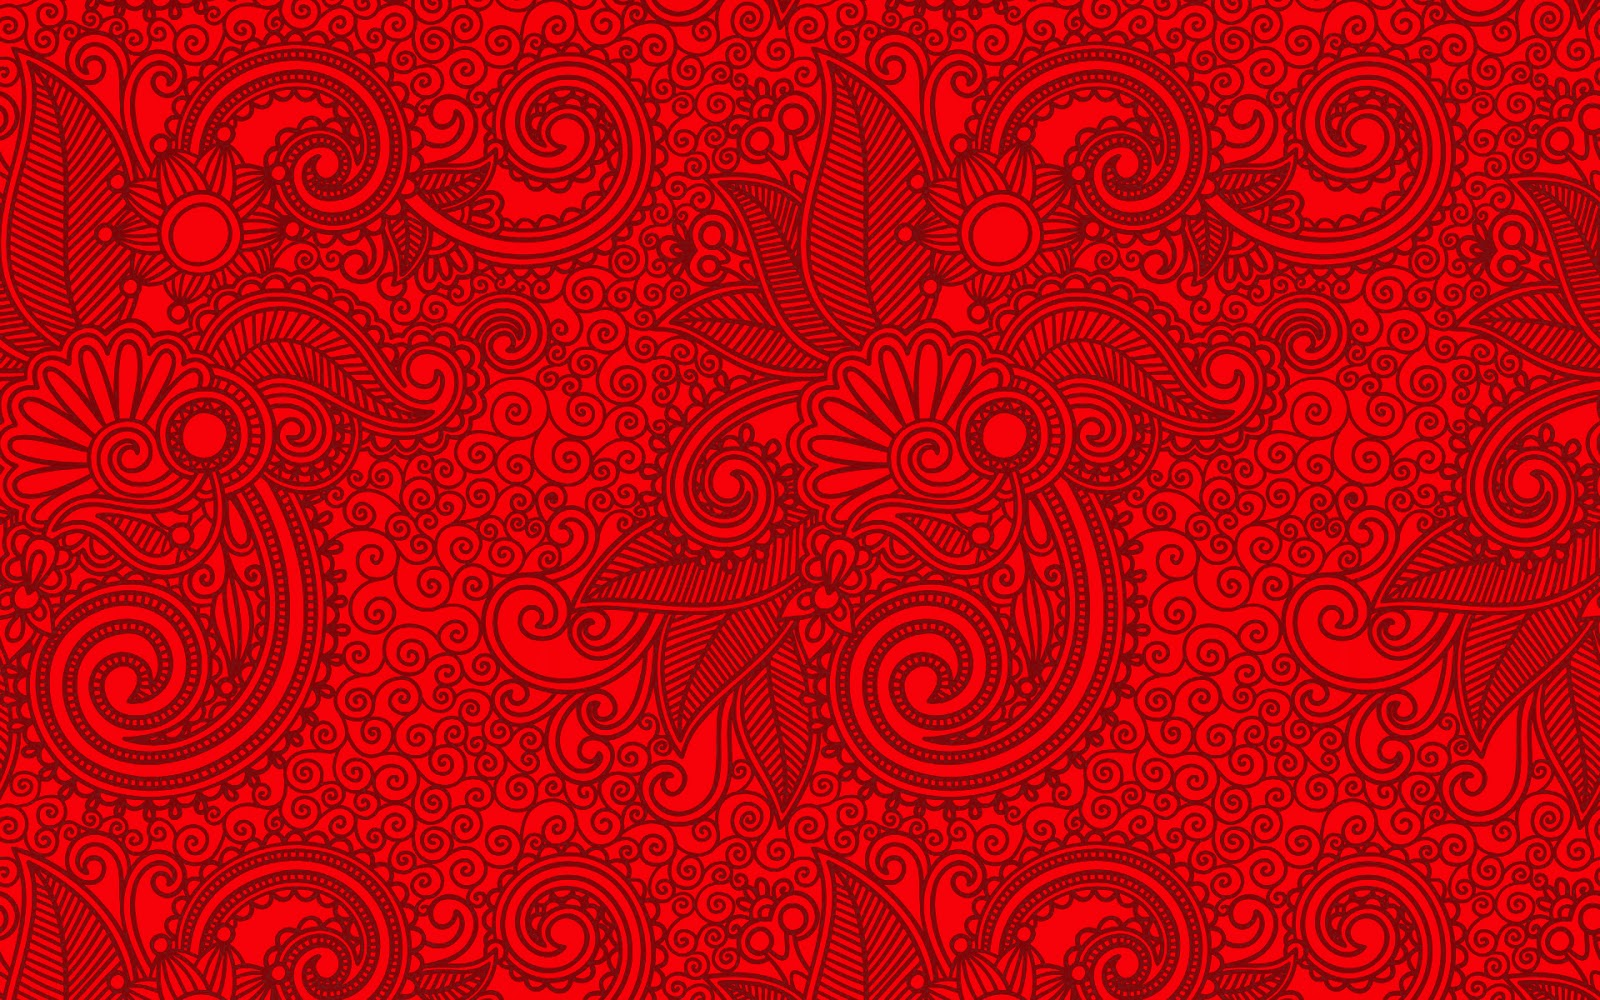 Kumpulan Desain Background Nuansa Batik Bunga Super keren